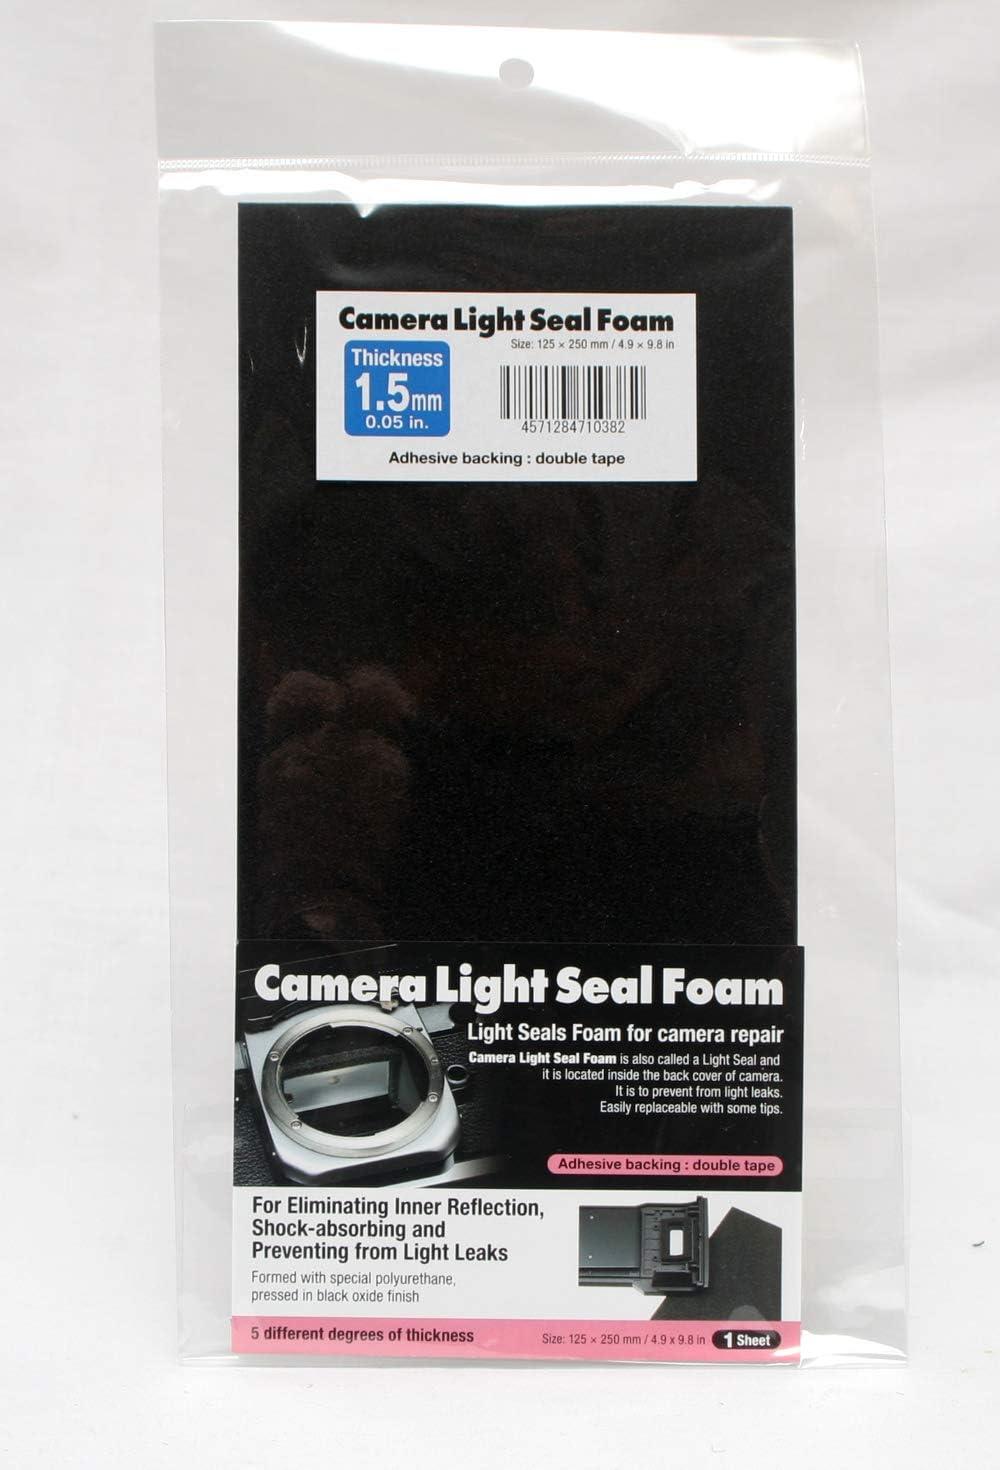 Camera Light Seal Form 250 X 125 X 1.5mm 9.84 X 4.92 X 0.05 in